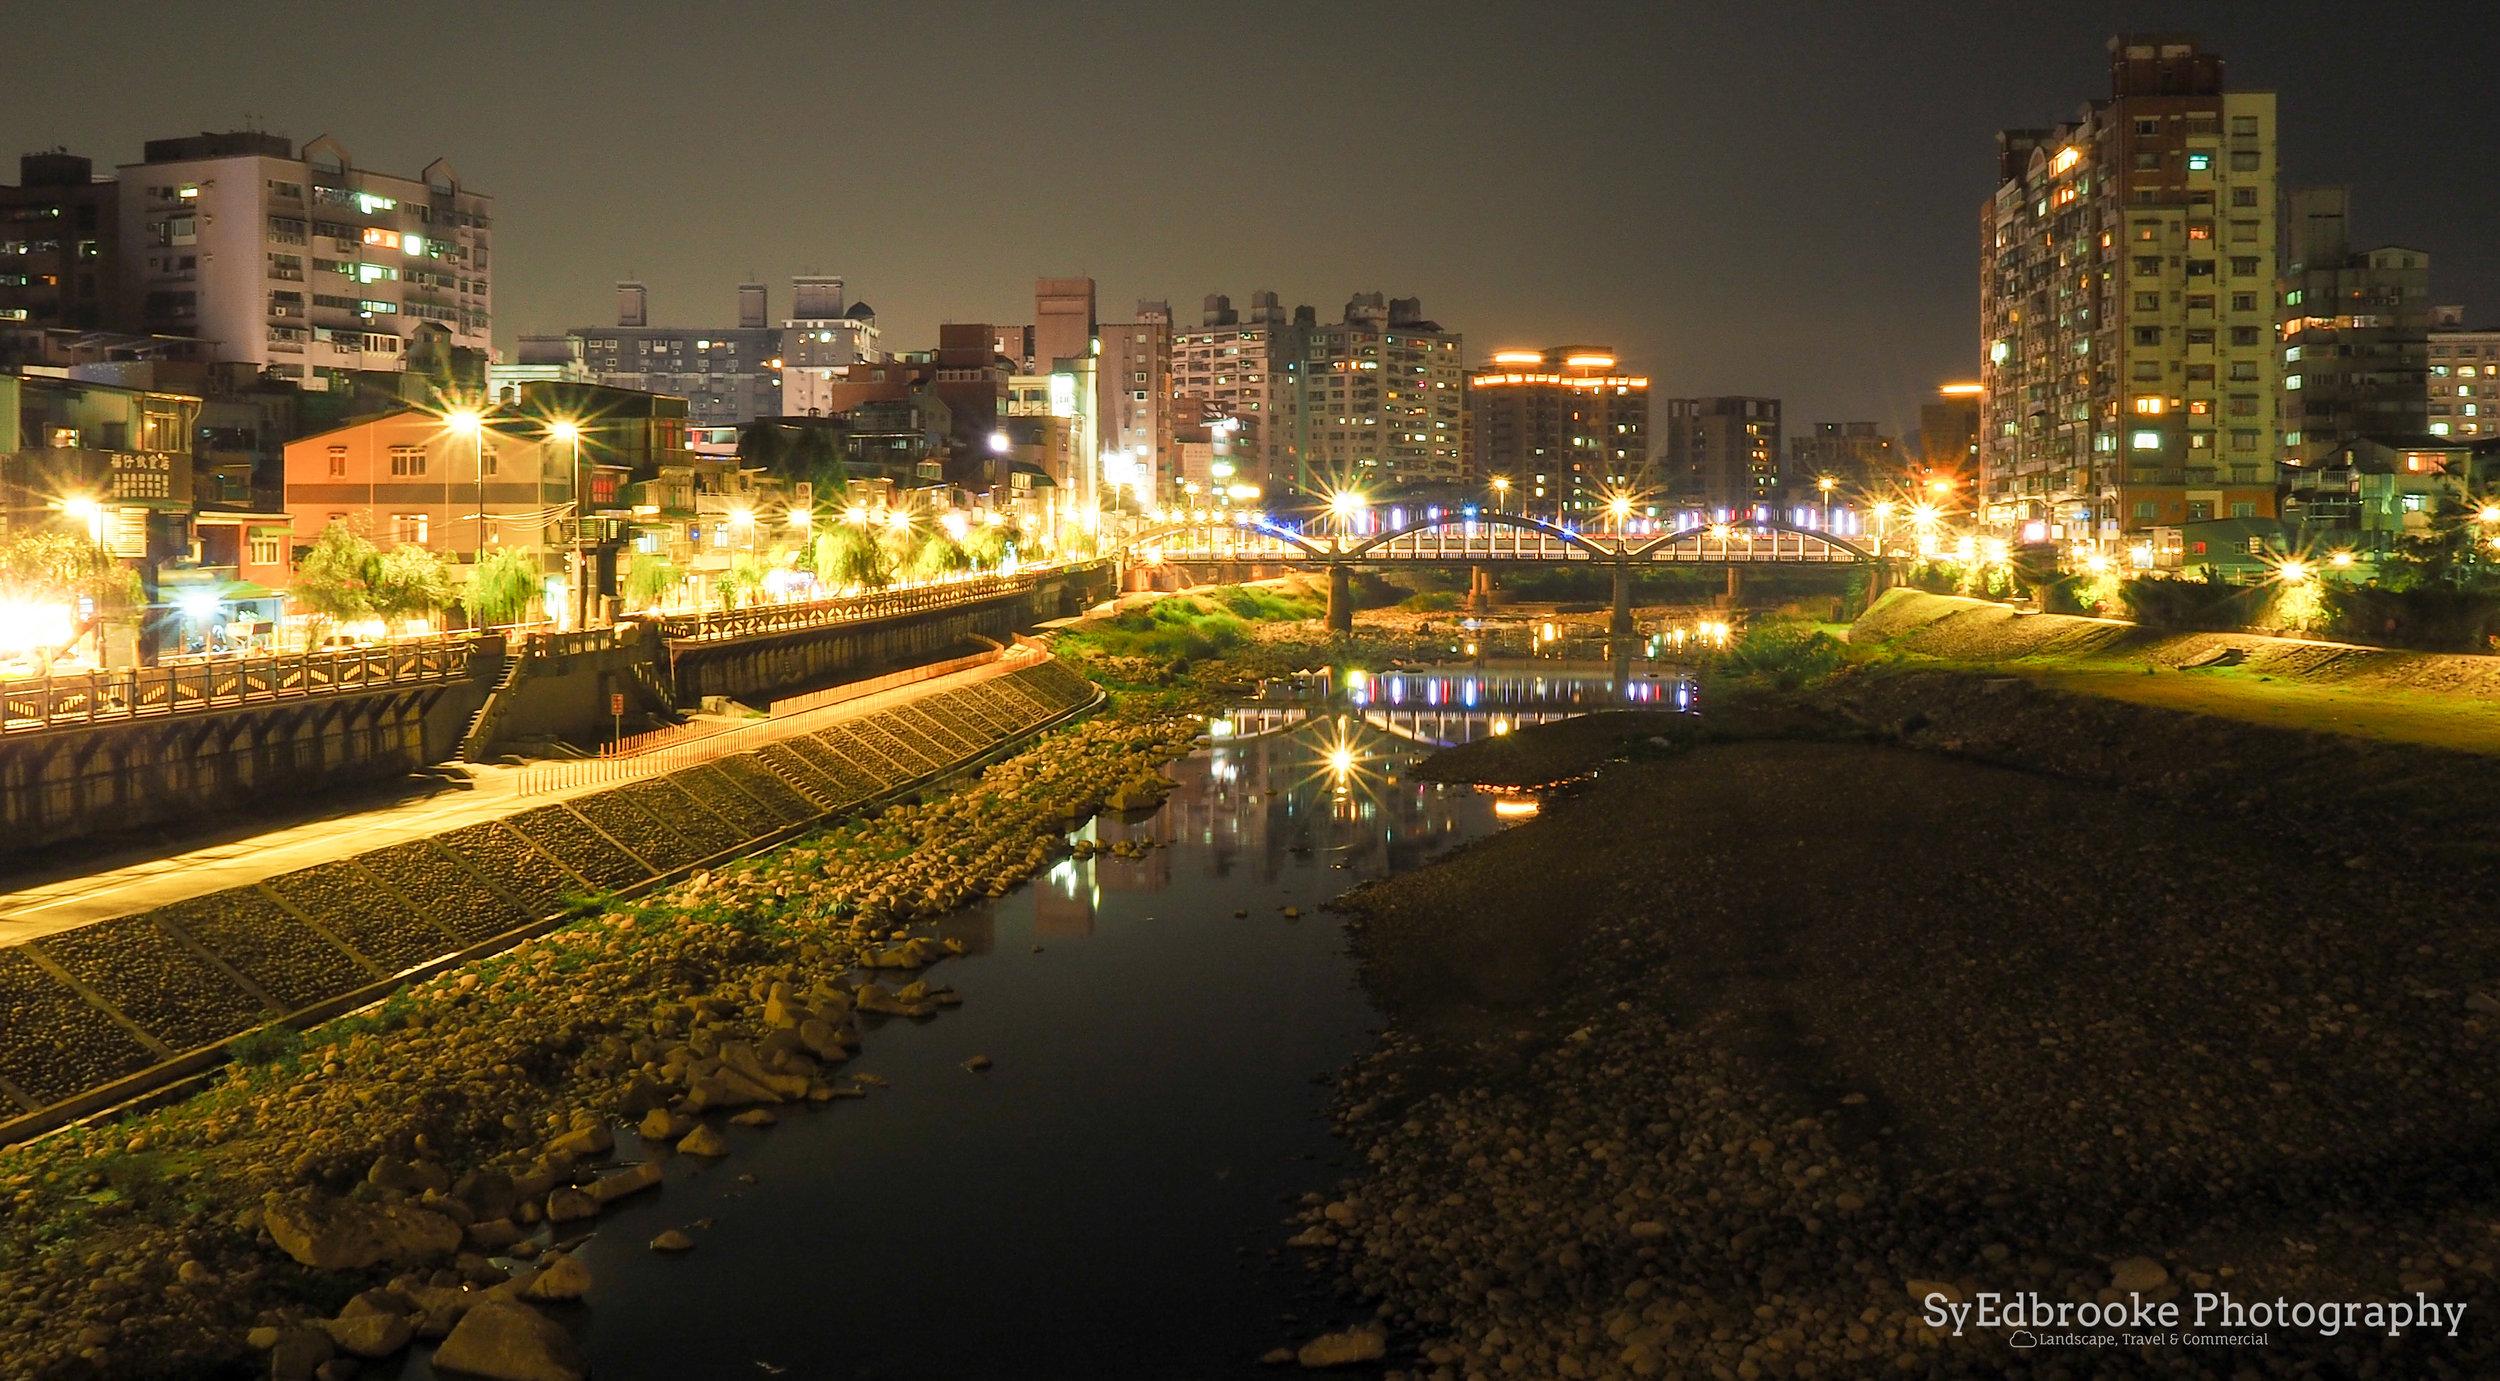 Riverside lights. f20, ISO 200, 60, 17mm